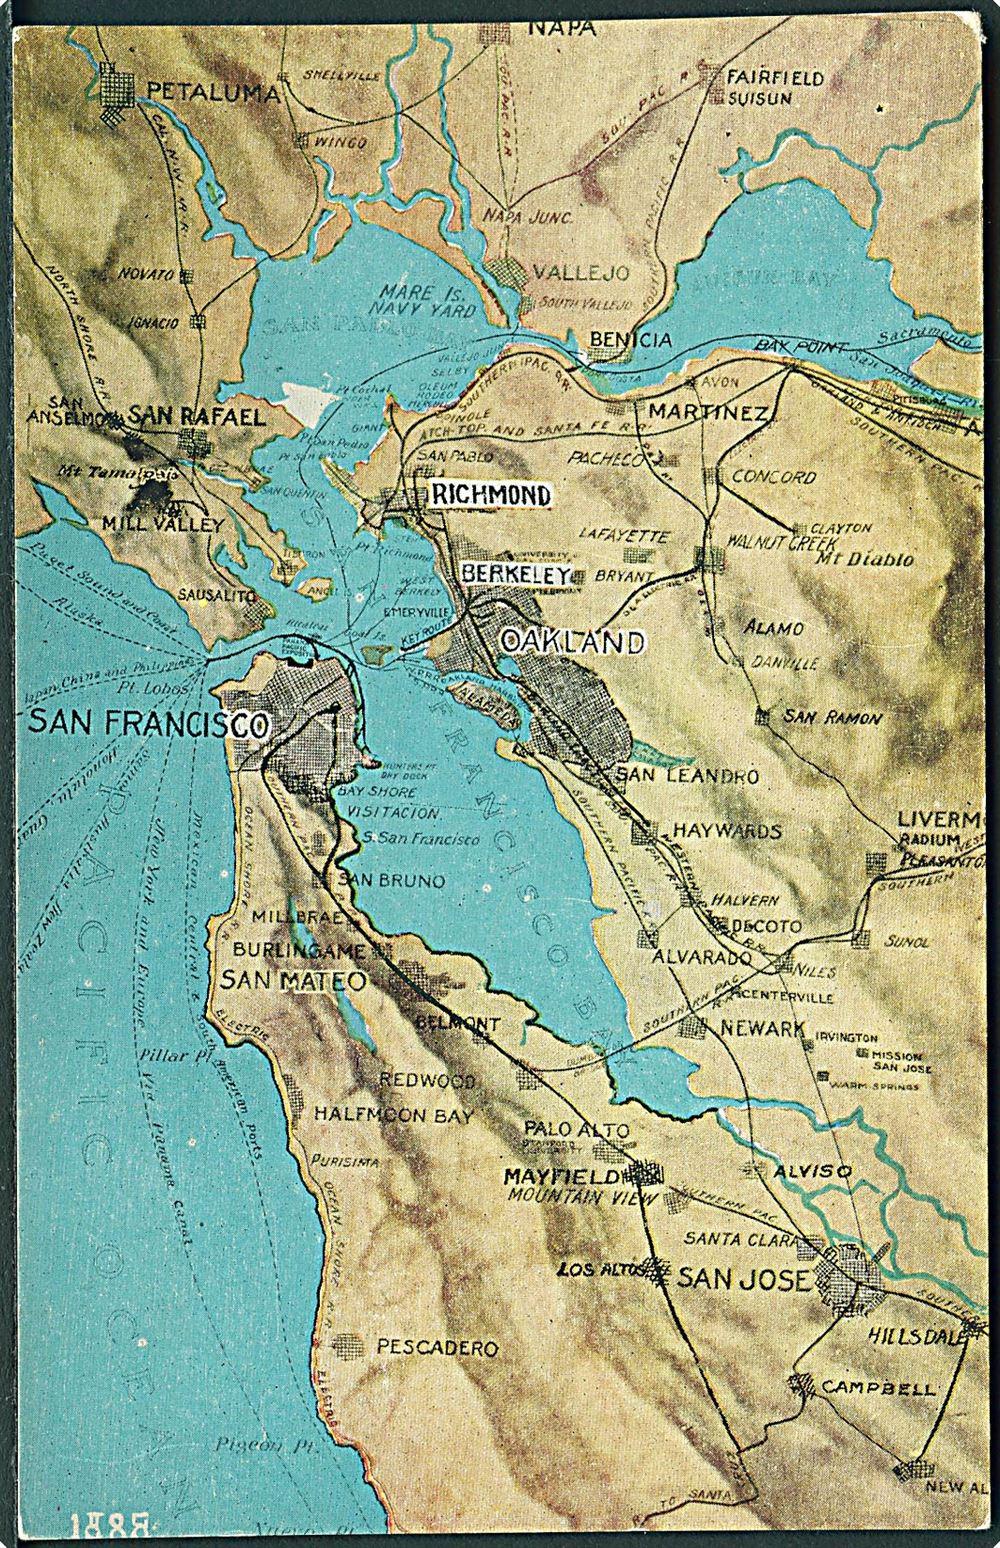 Kort Over San Francisco Bay Pacific Novelty Co U No Usa Postkort